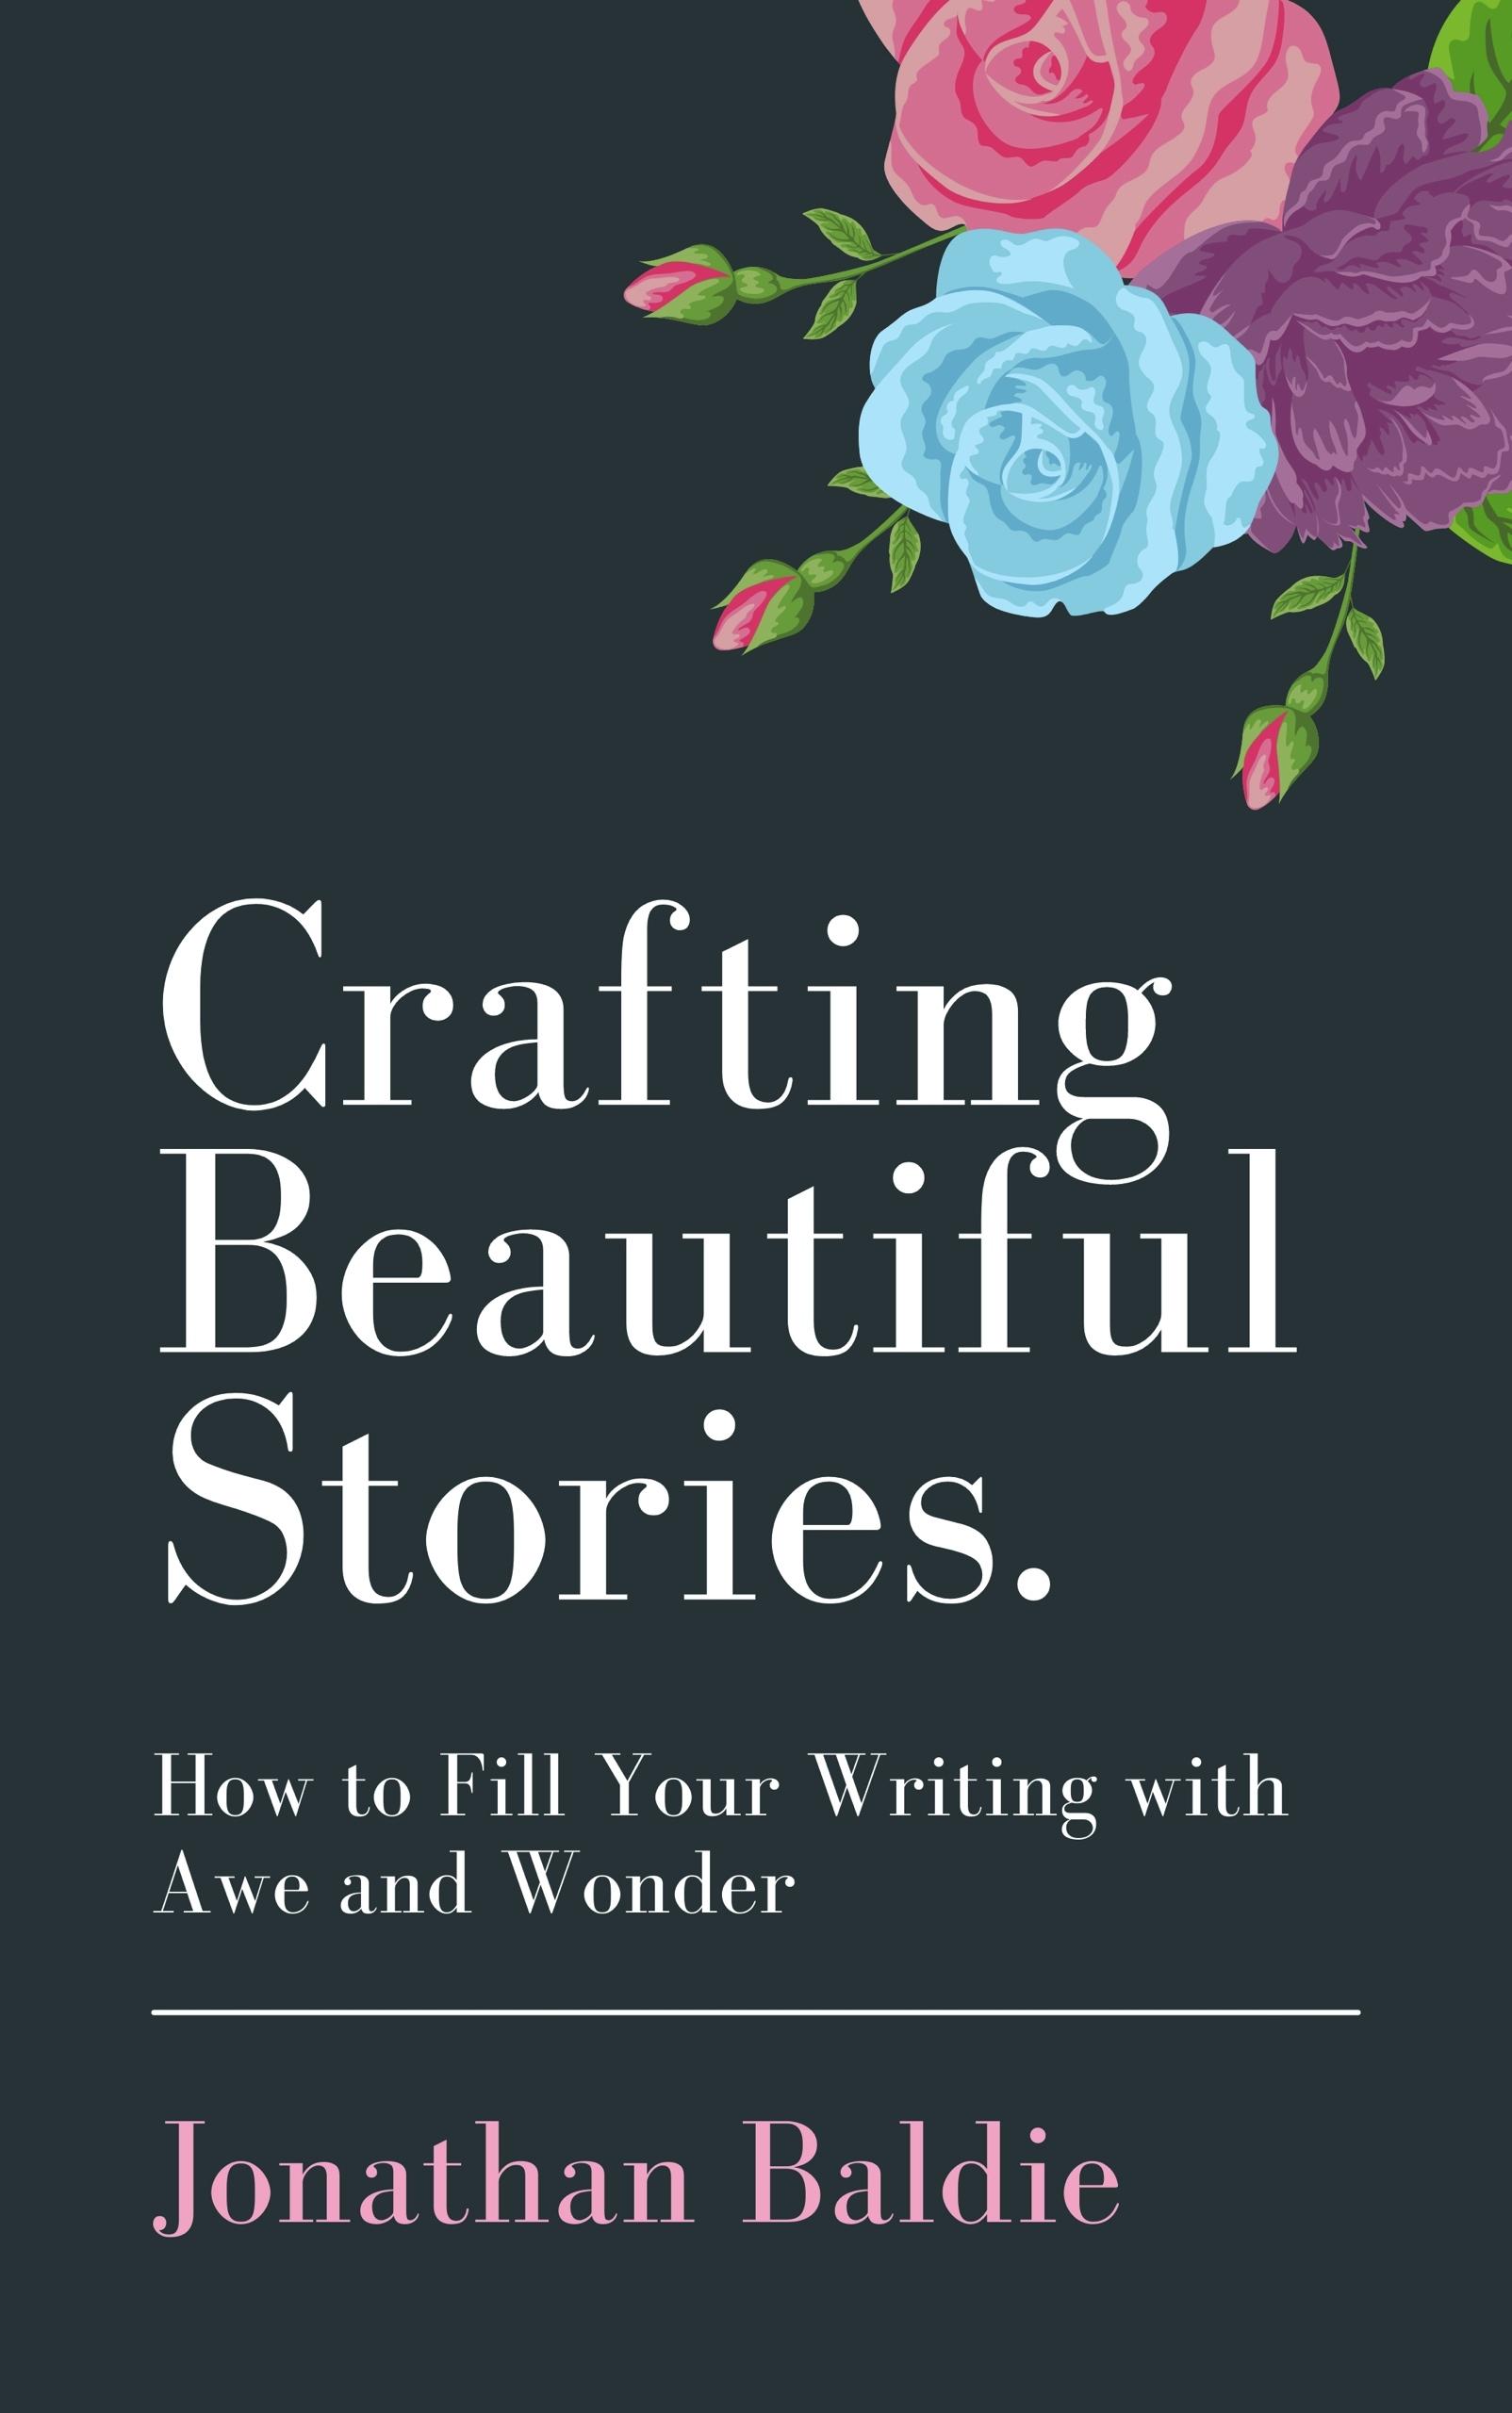 Crafting Beautiful Stories